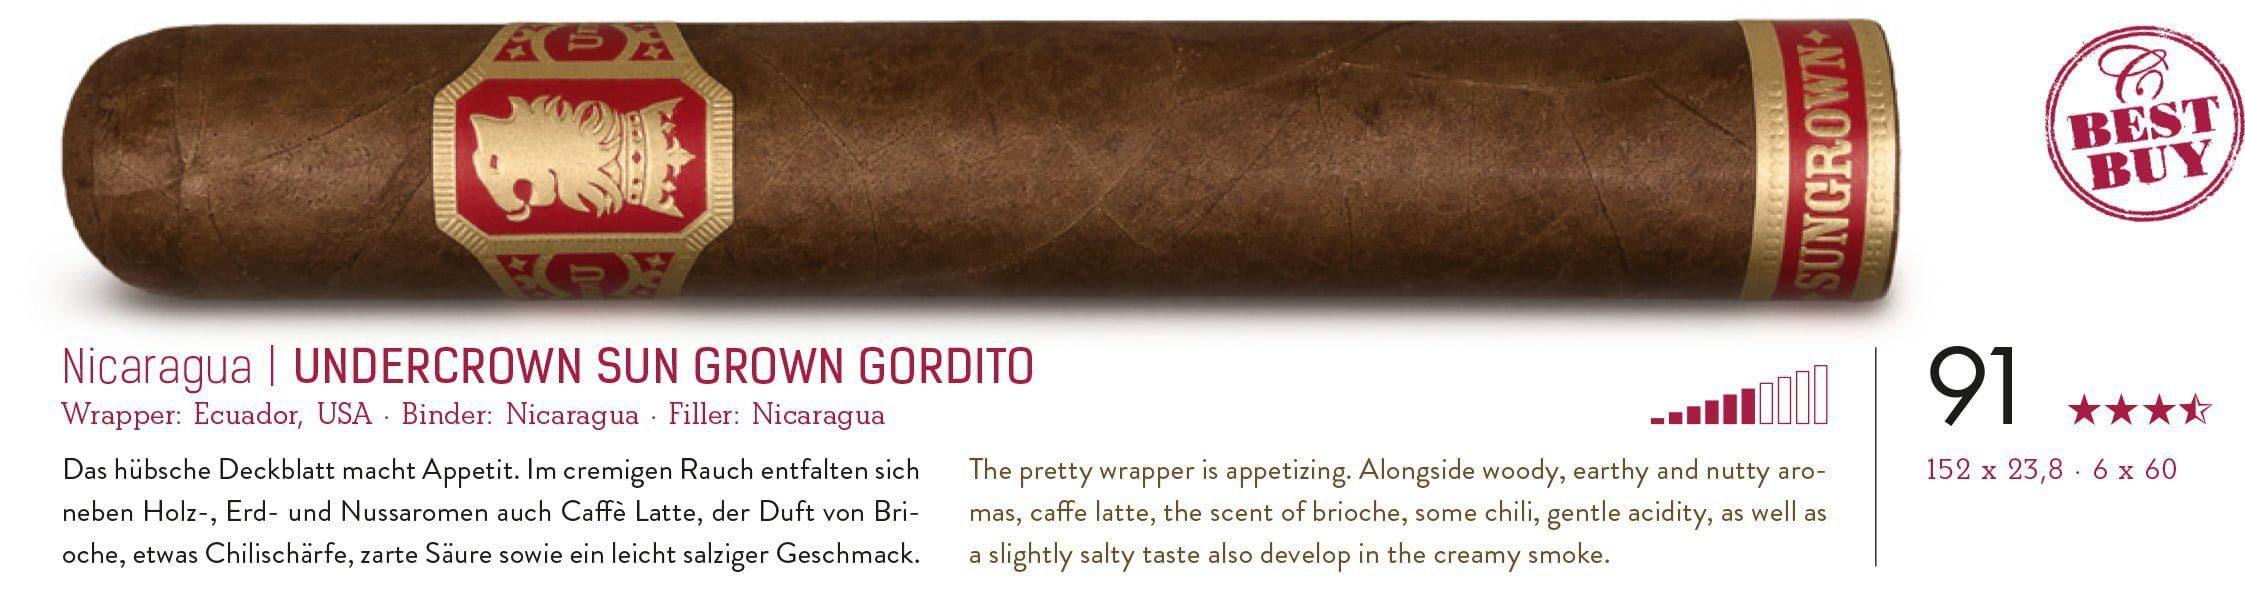 Undercrown Sun Grown Gordito